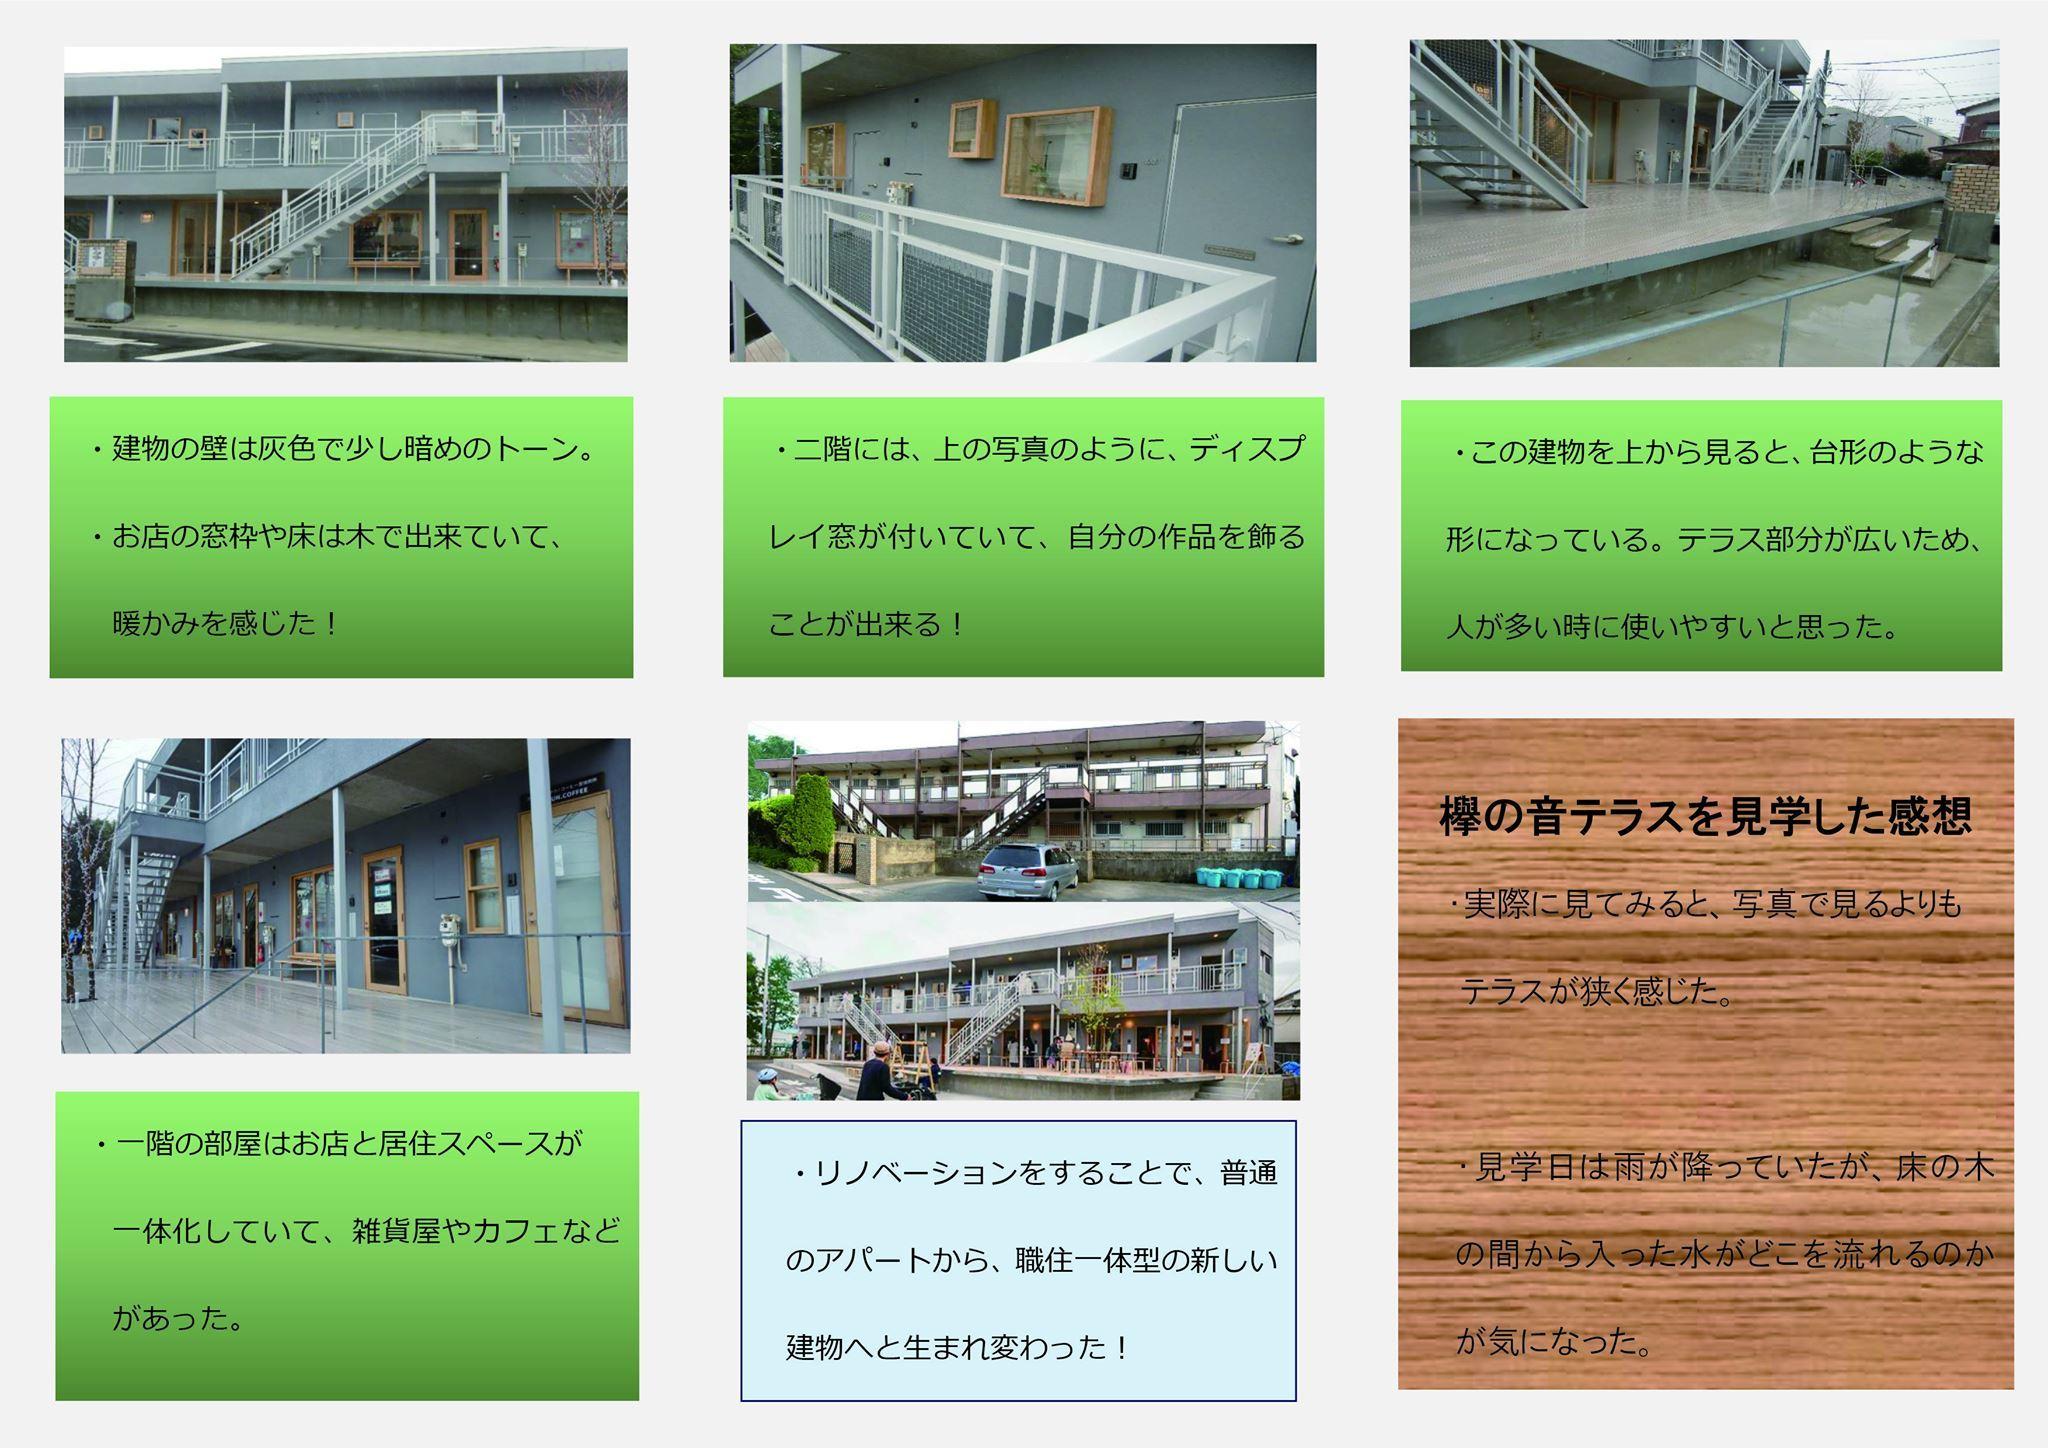 地元中学校の職場体験の成果_d0004728_09260168.jpg